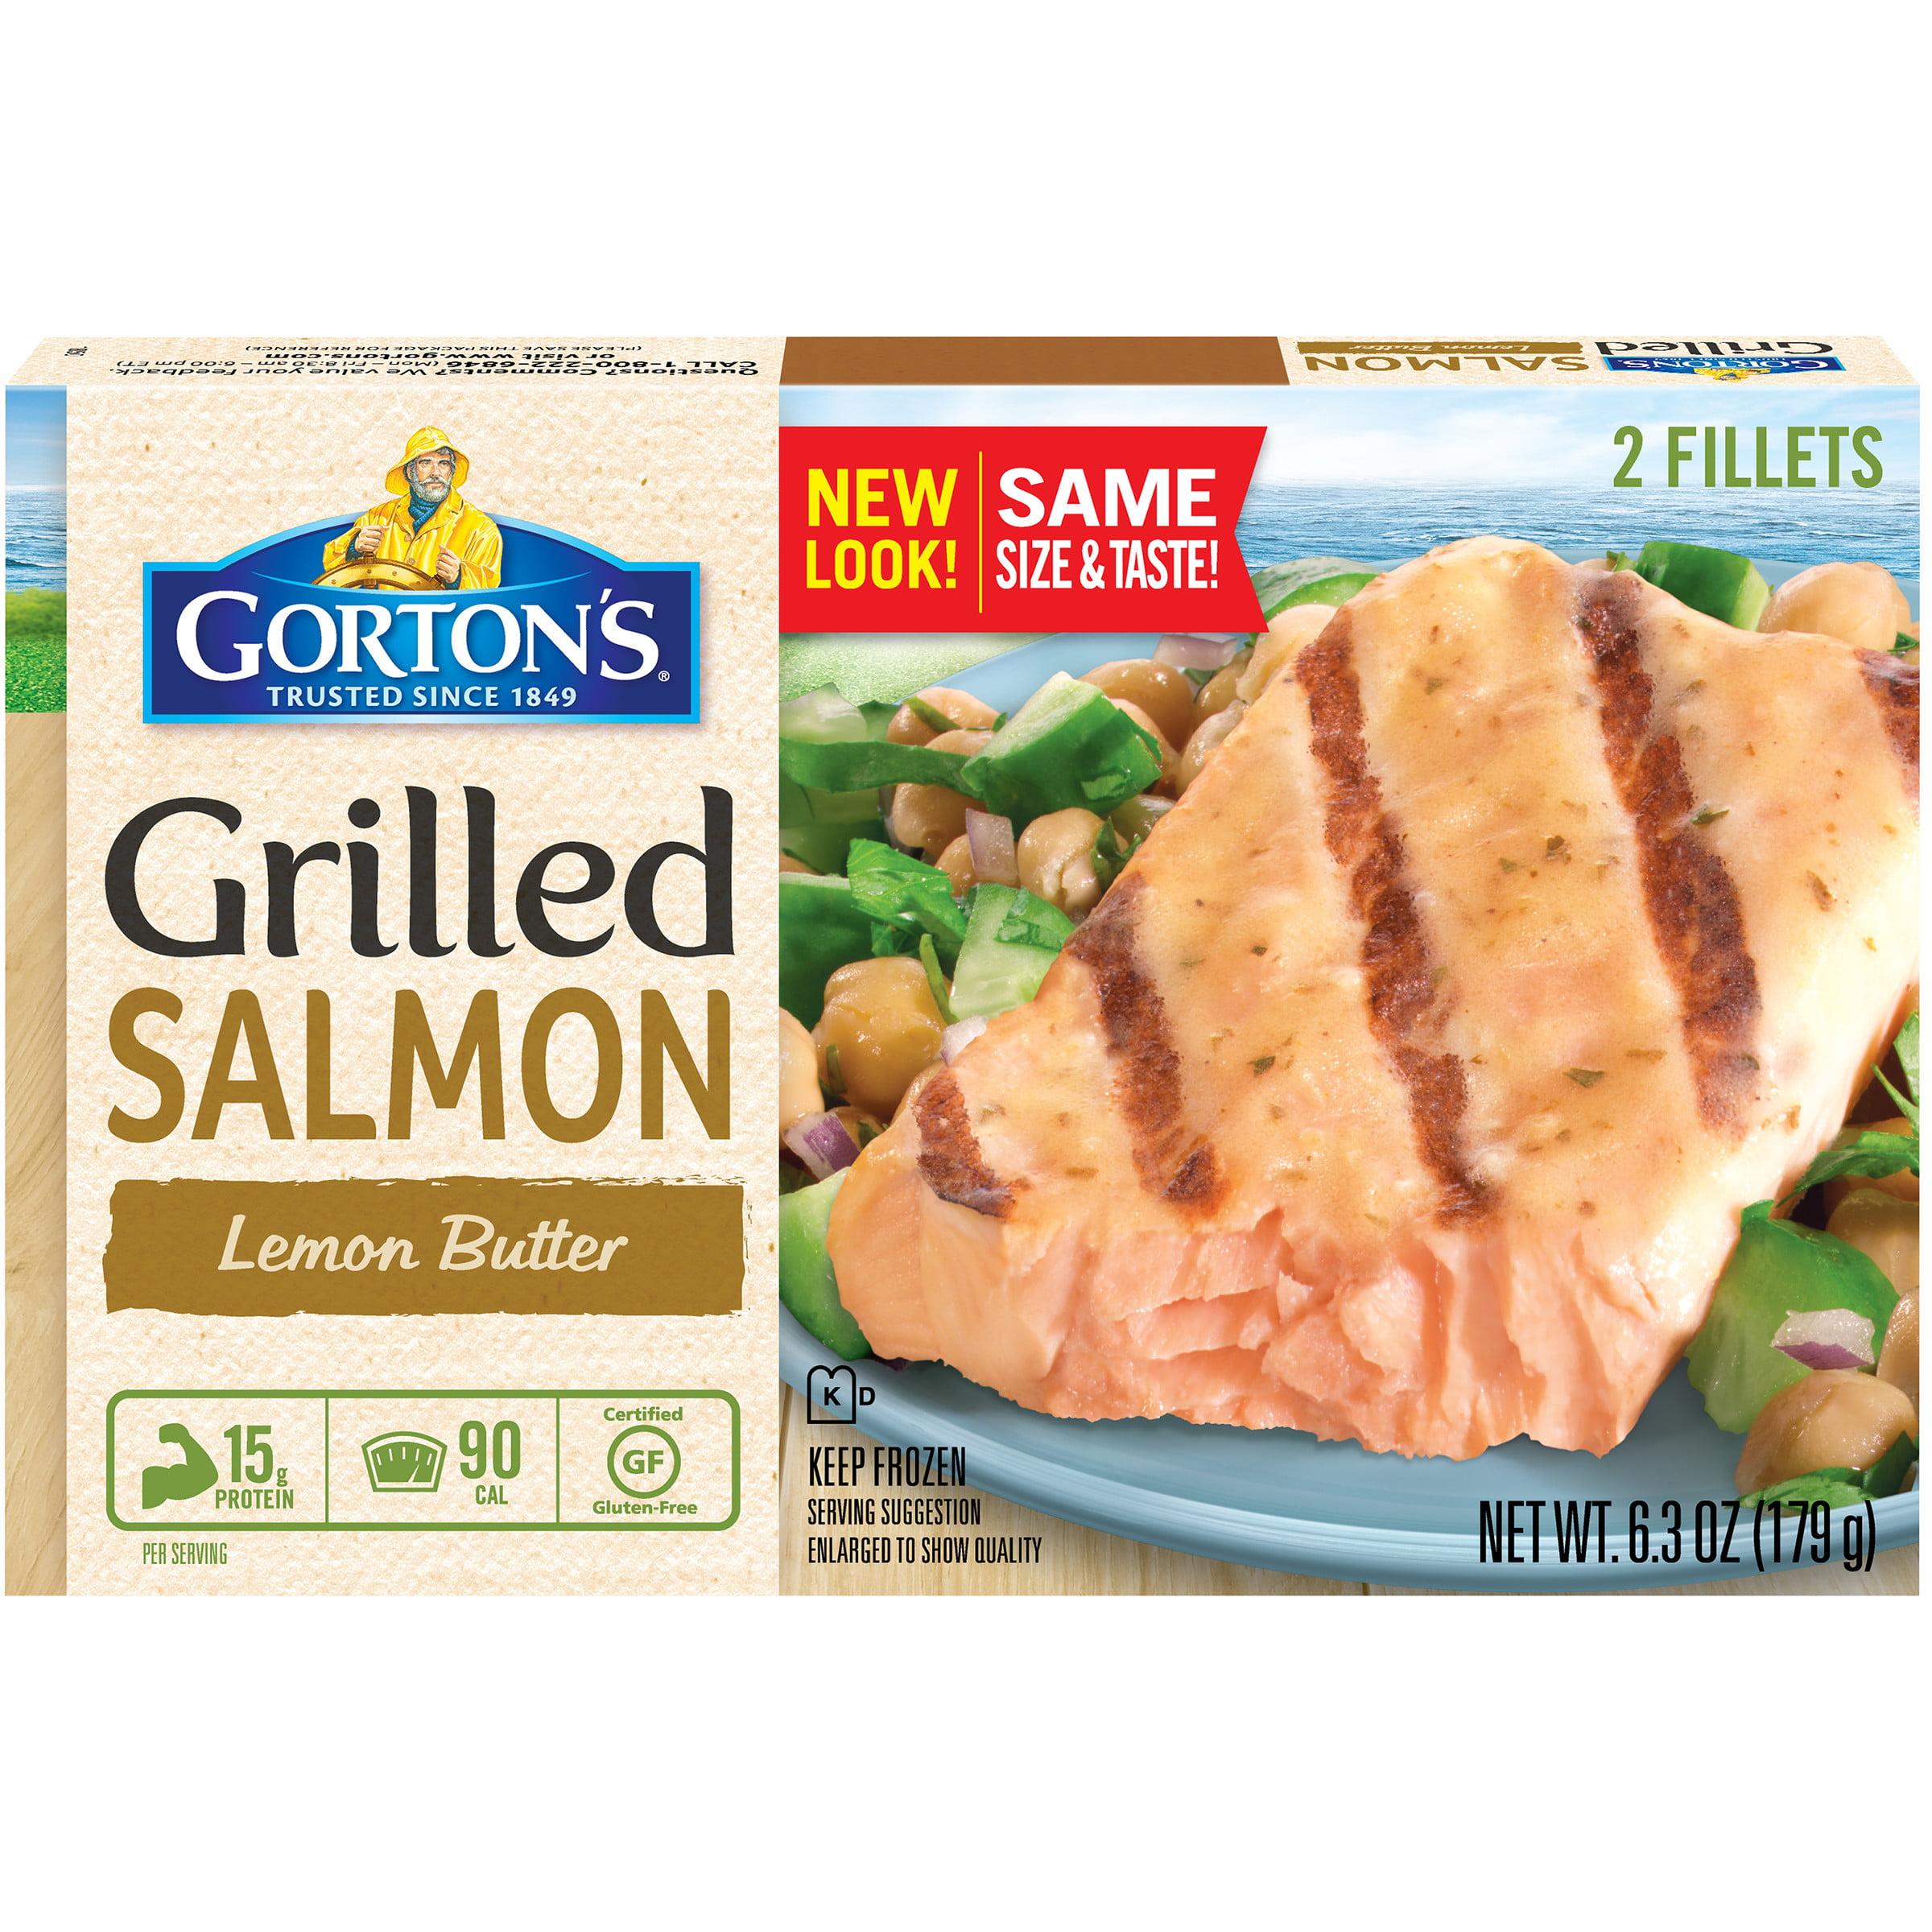 Gorton's Lemon Butter Grilled Salmon Fillets, 2 count